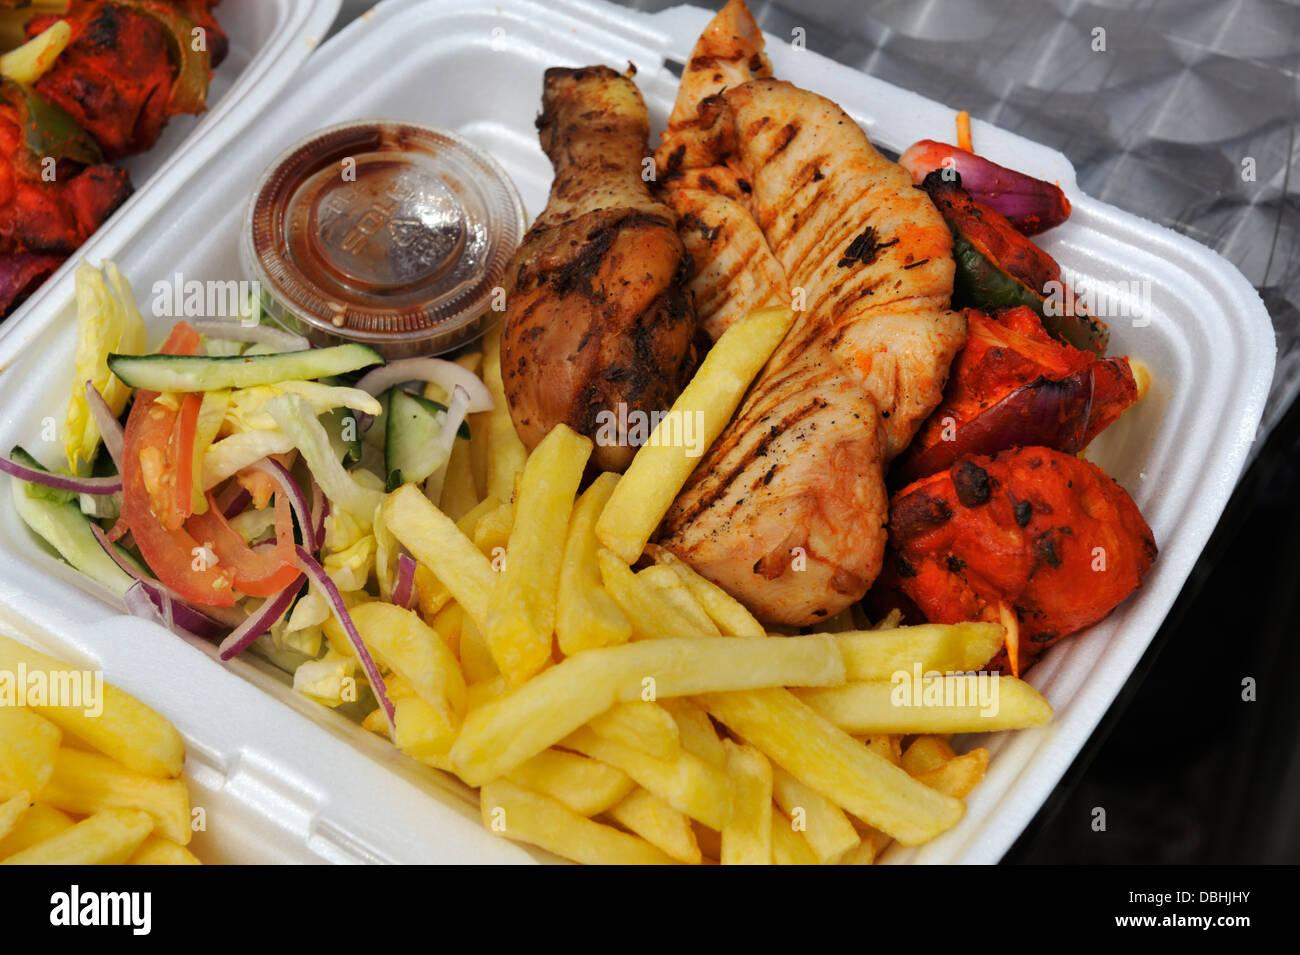 Take away food - Stock Image